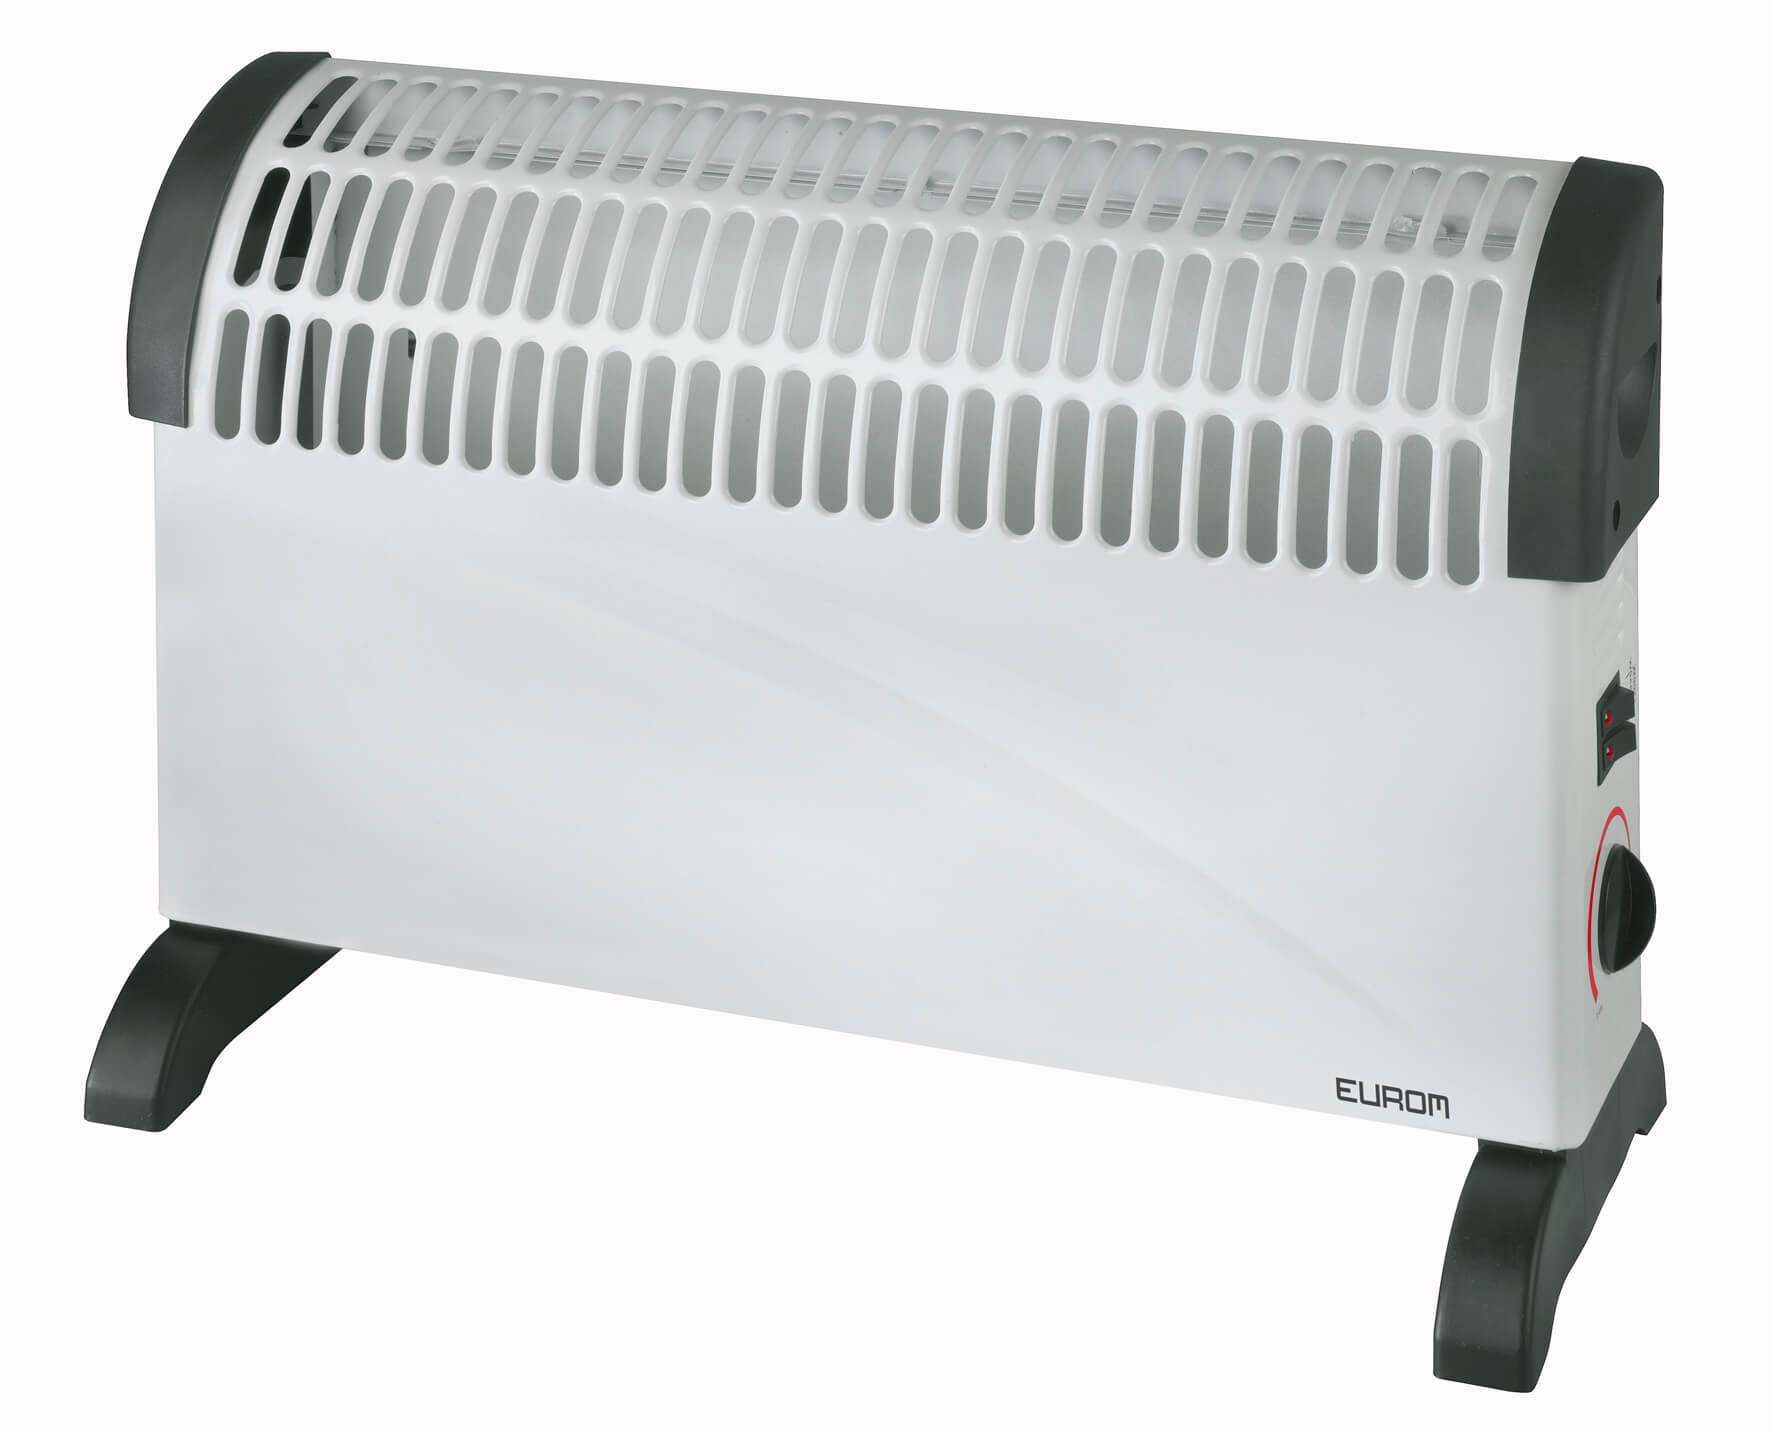 Eurom CK1500 Elektrische verwarming 1500 W | Convectorkachel